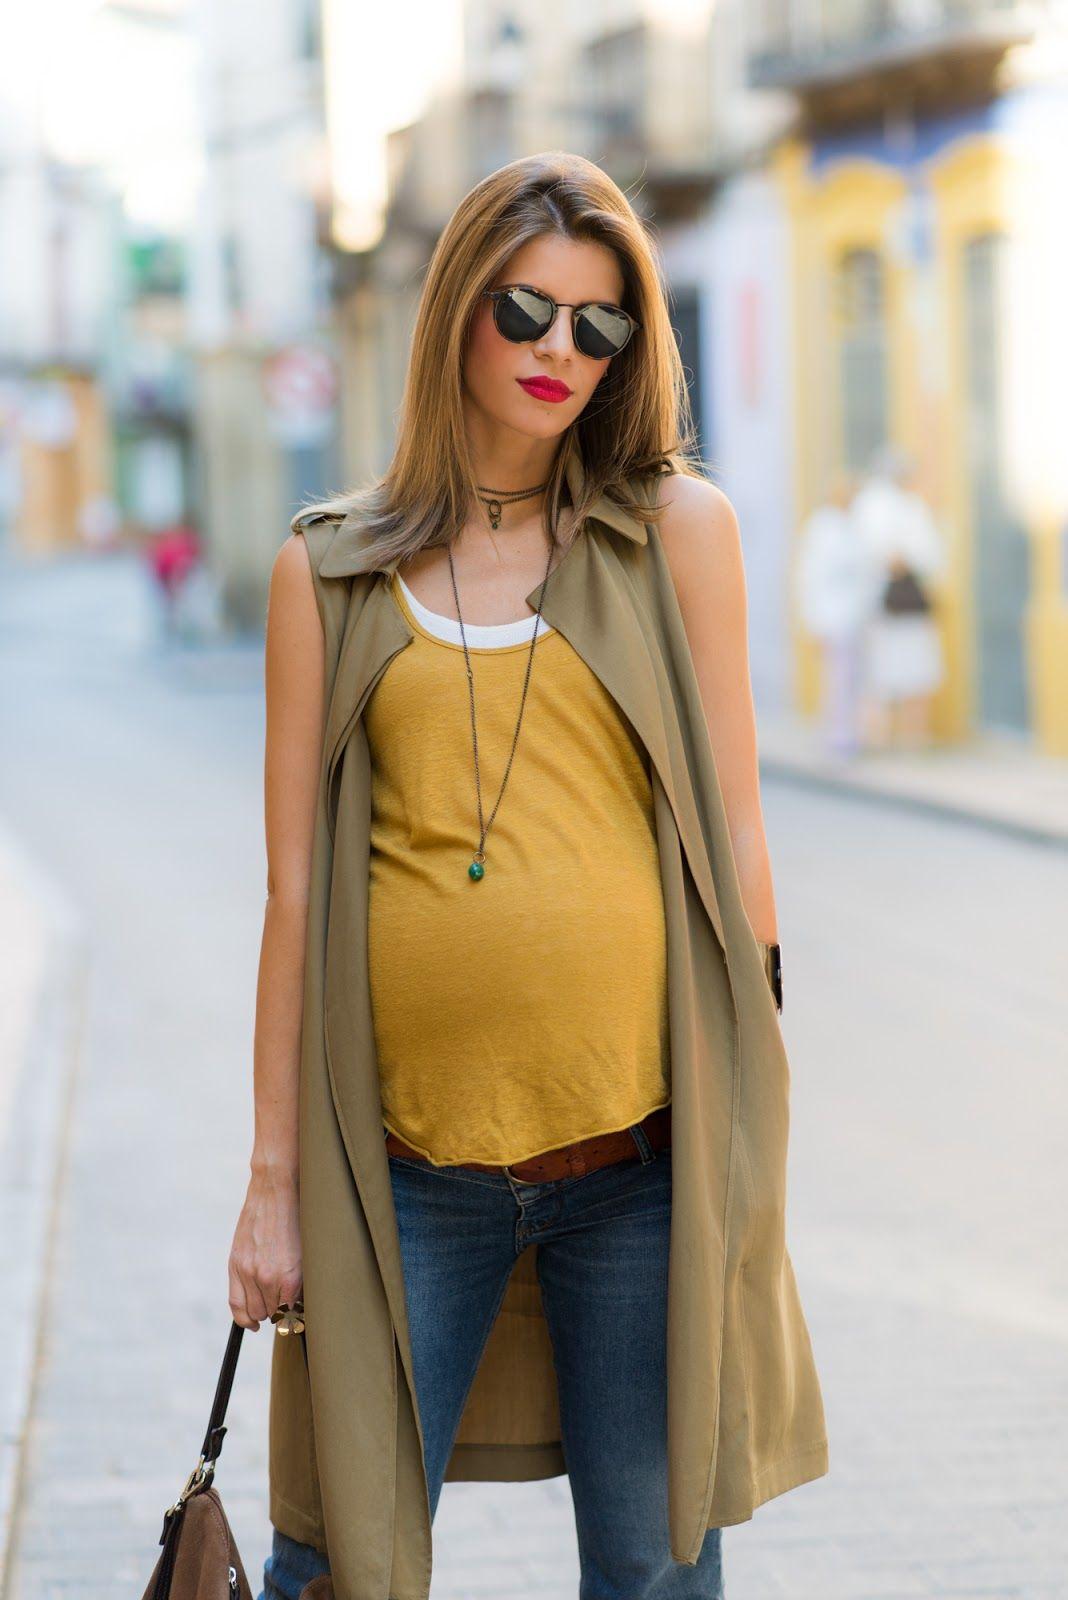 Ms Treinta - Blog de moda y tendencias by Alba. - Fashion Blogger -  37  weeks  vest 8421ff0795da9